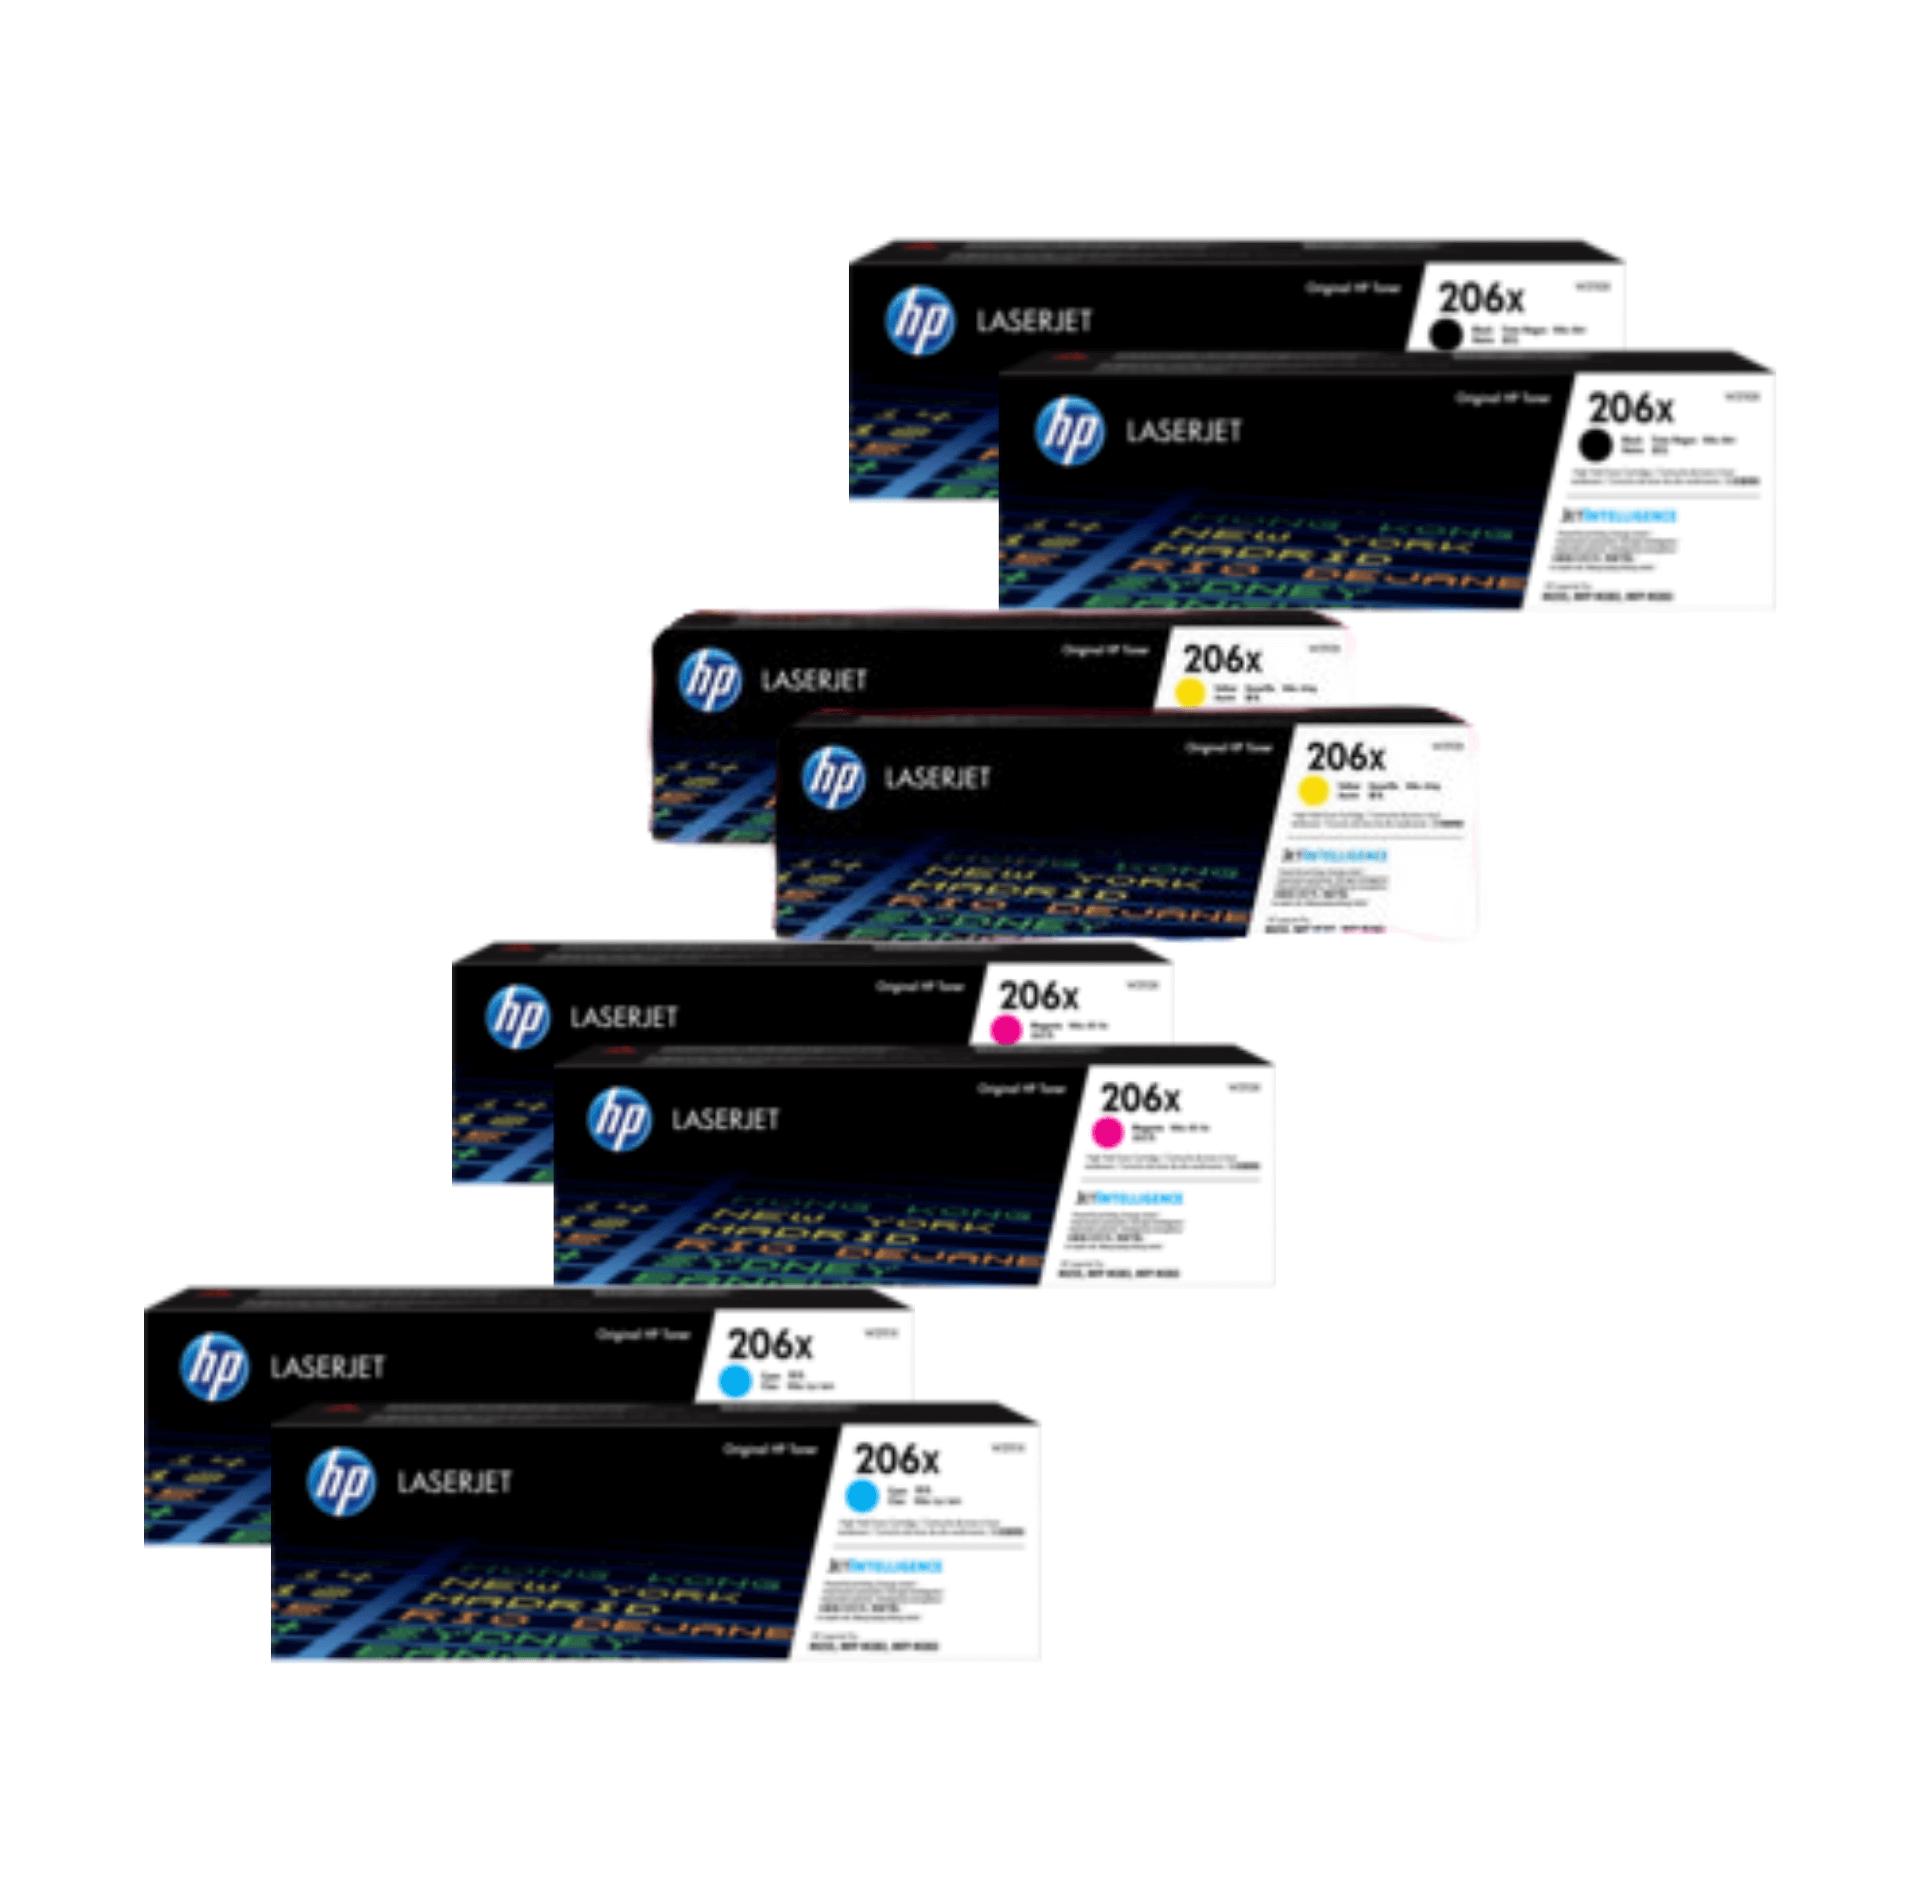 HP 206X Toner Cartridges Value Pack - Includes: [2 x Black, Cyan, Magenta, Yellow]